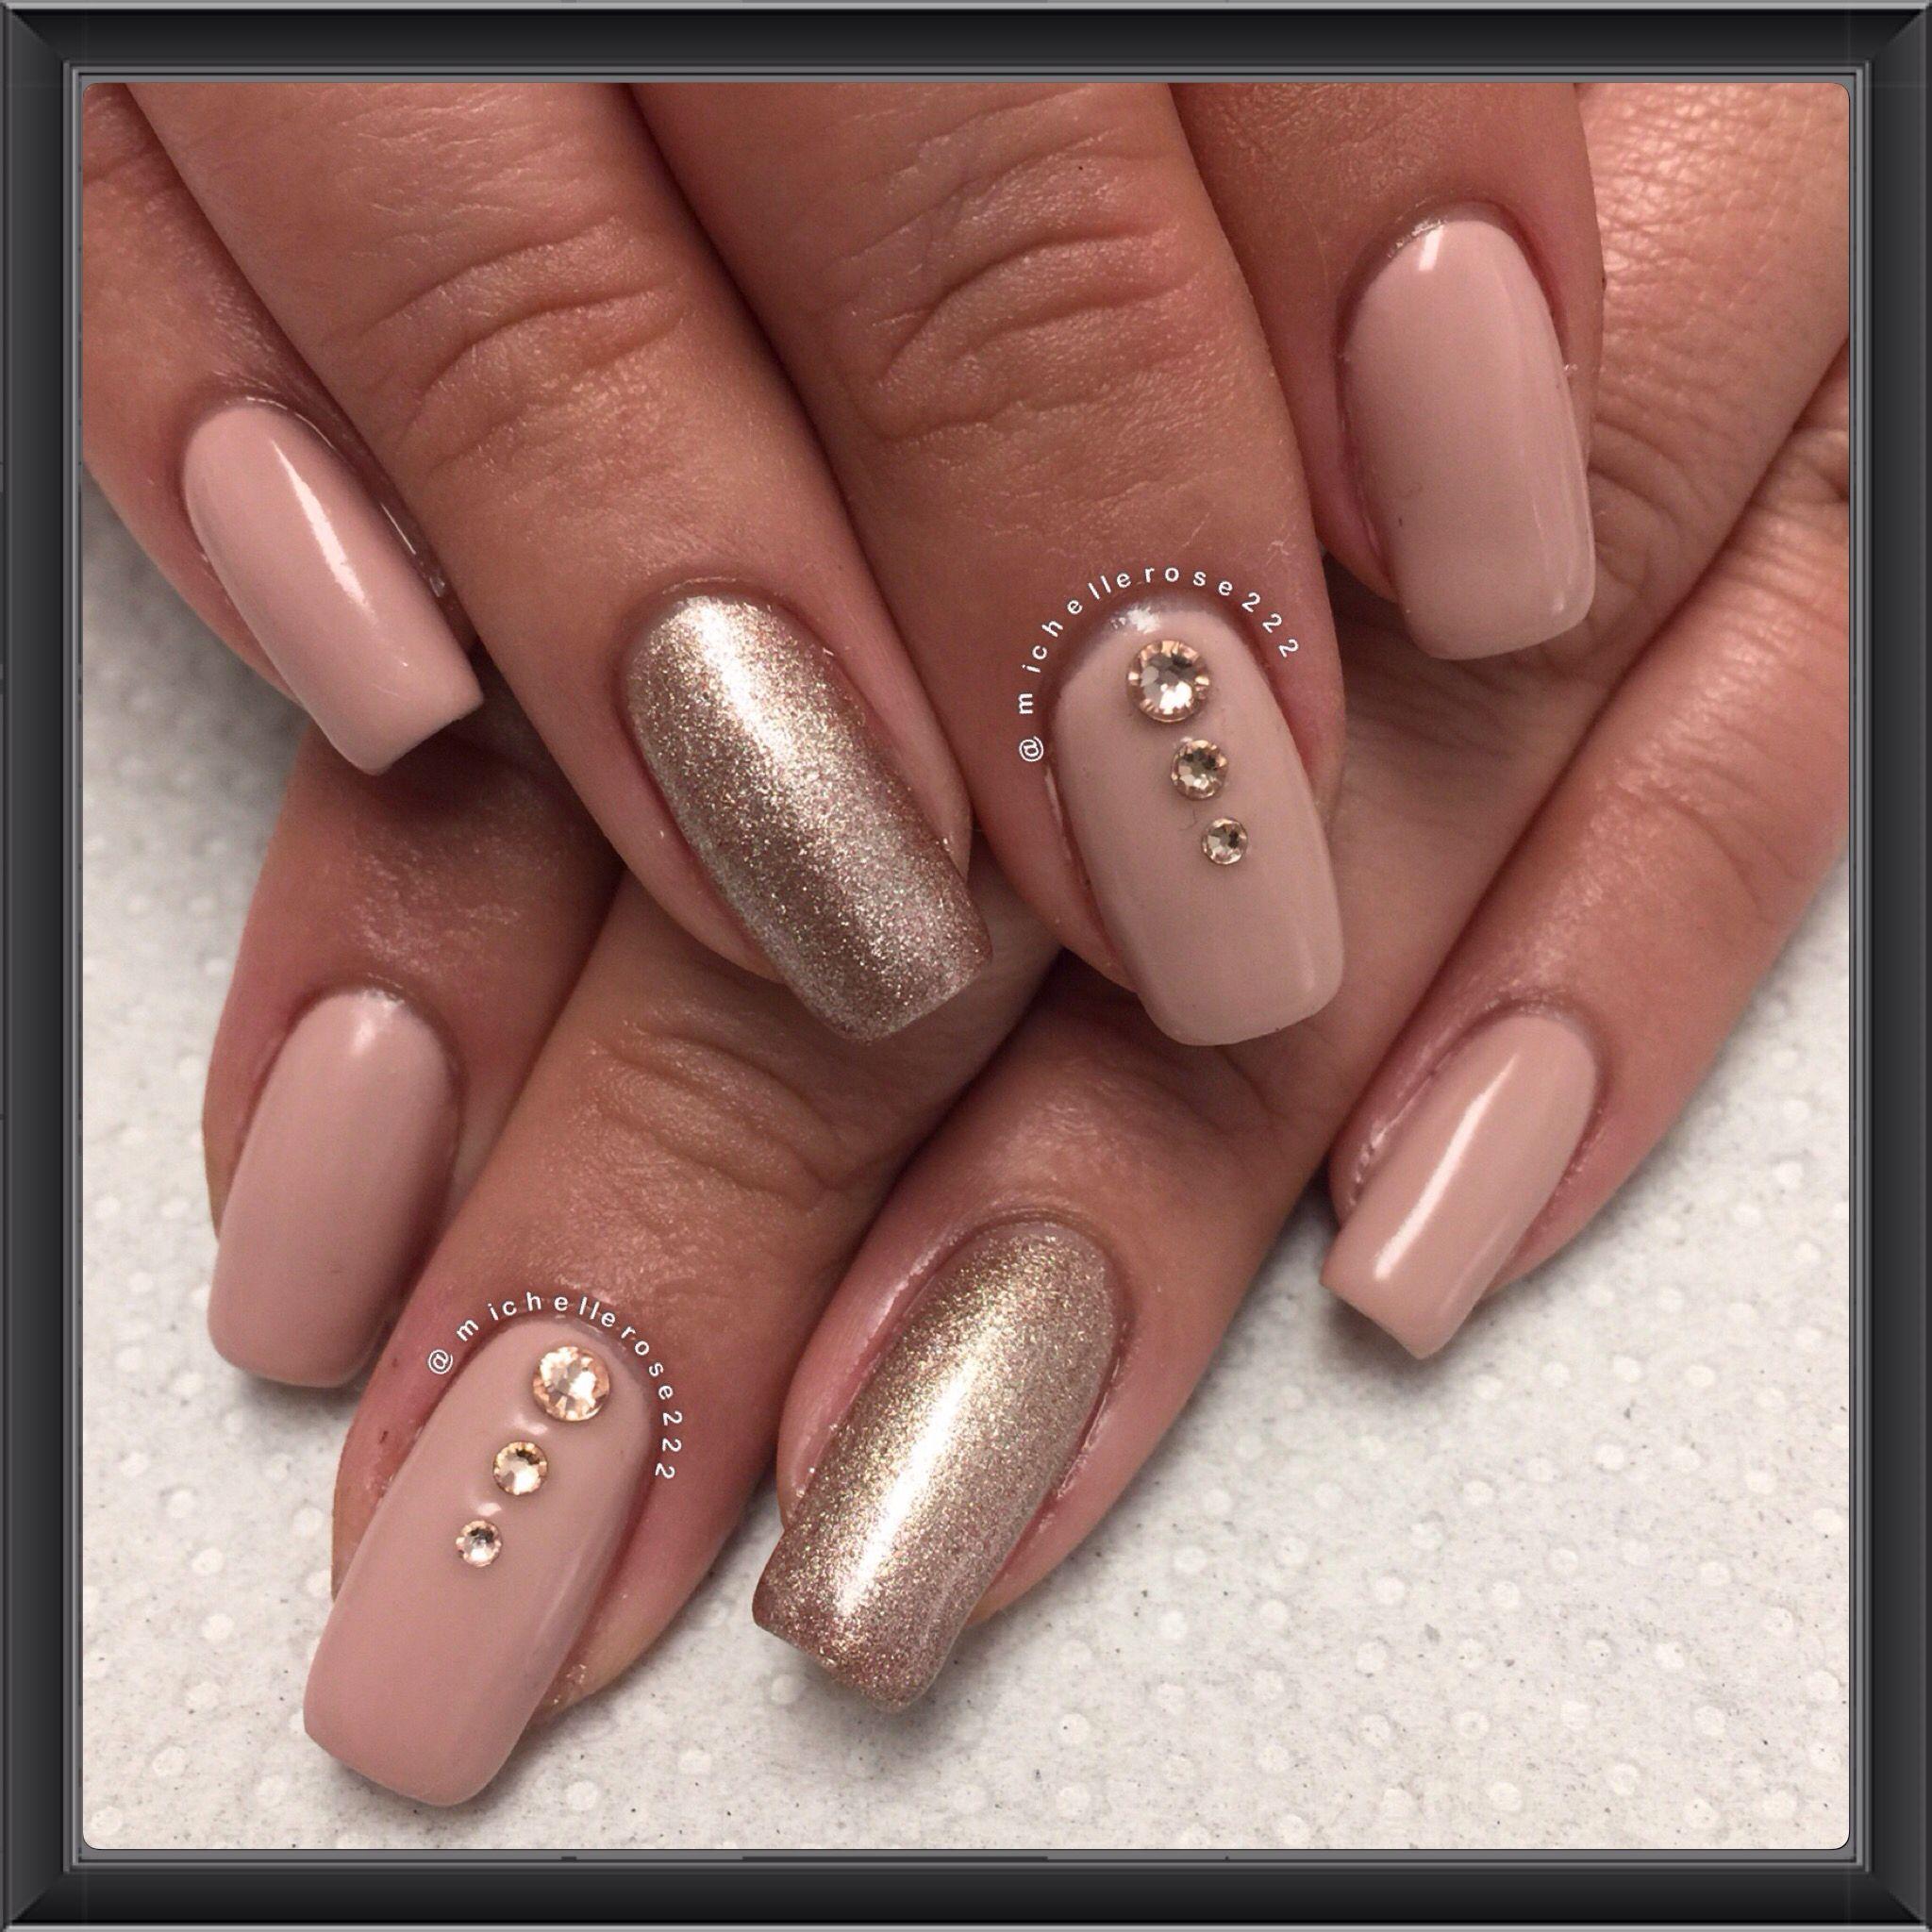 OPI Gelcolor - soakoffgelpolish - gel nail polish - elegant nails ...